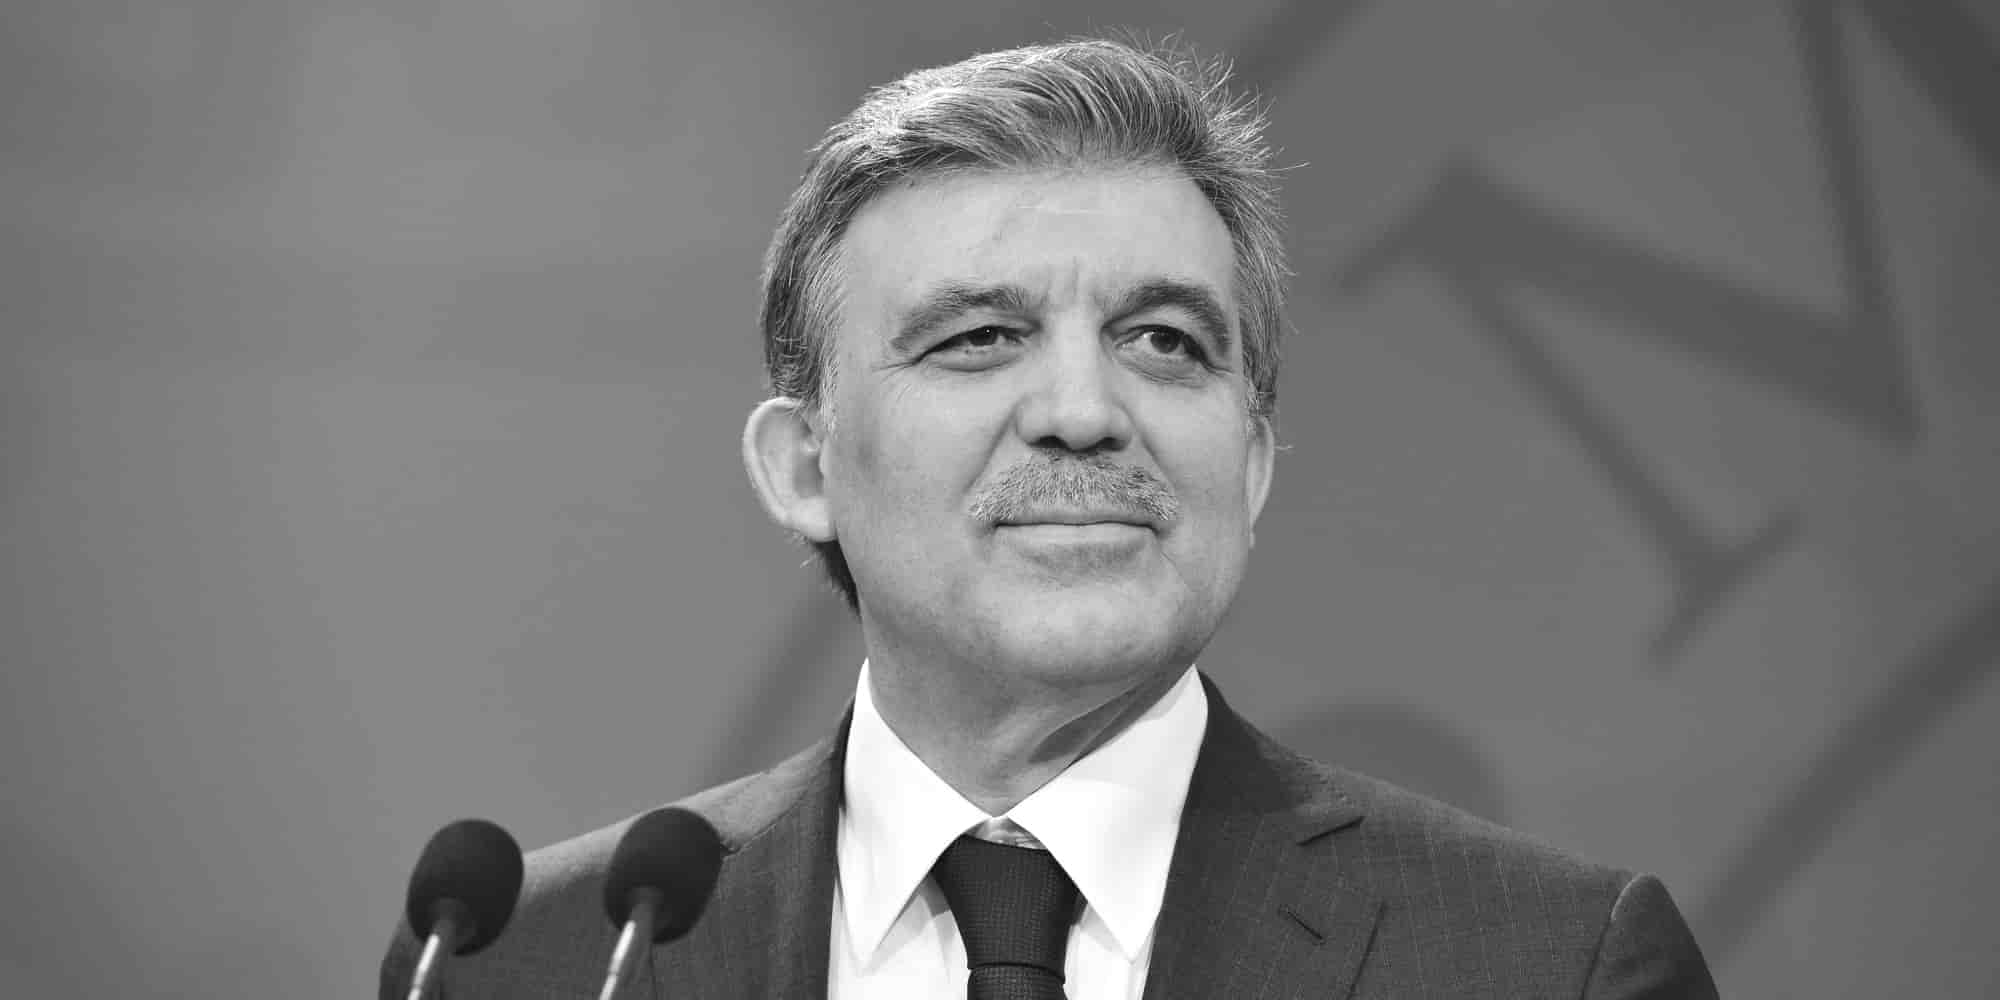 turkiye-cumhuriyetinin-11-cumhurbaskani-abdullah-gul-min-1.jpg